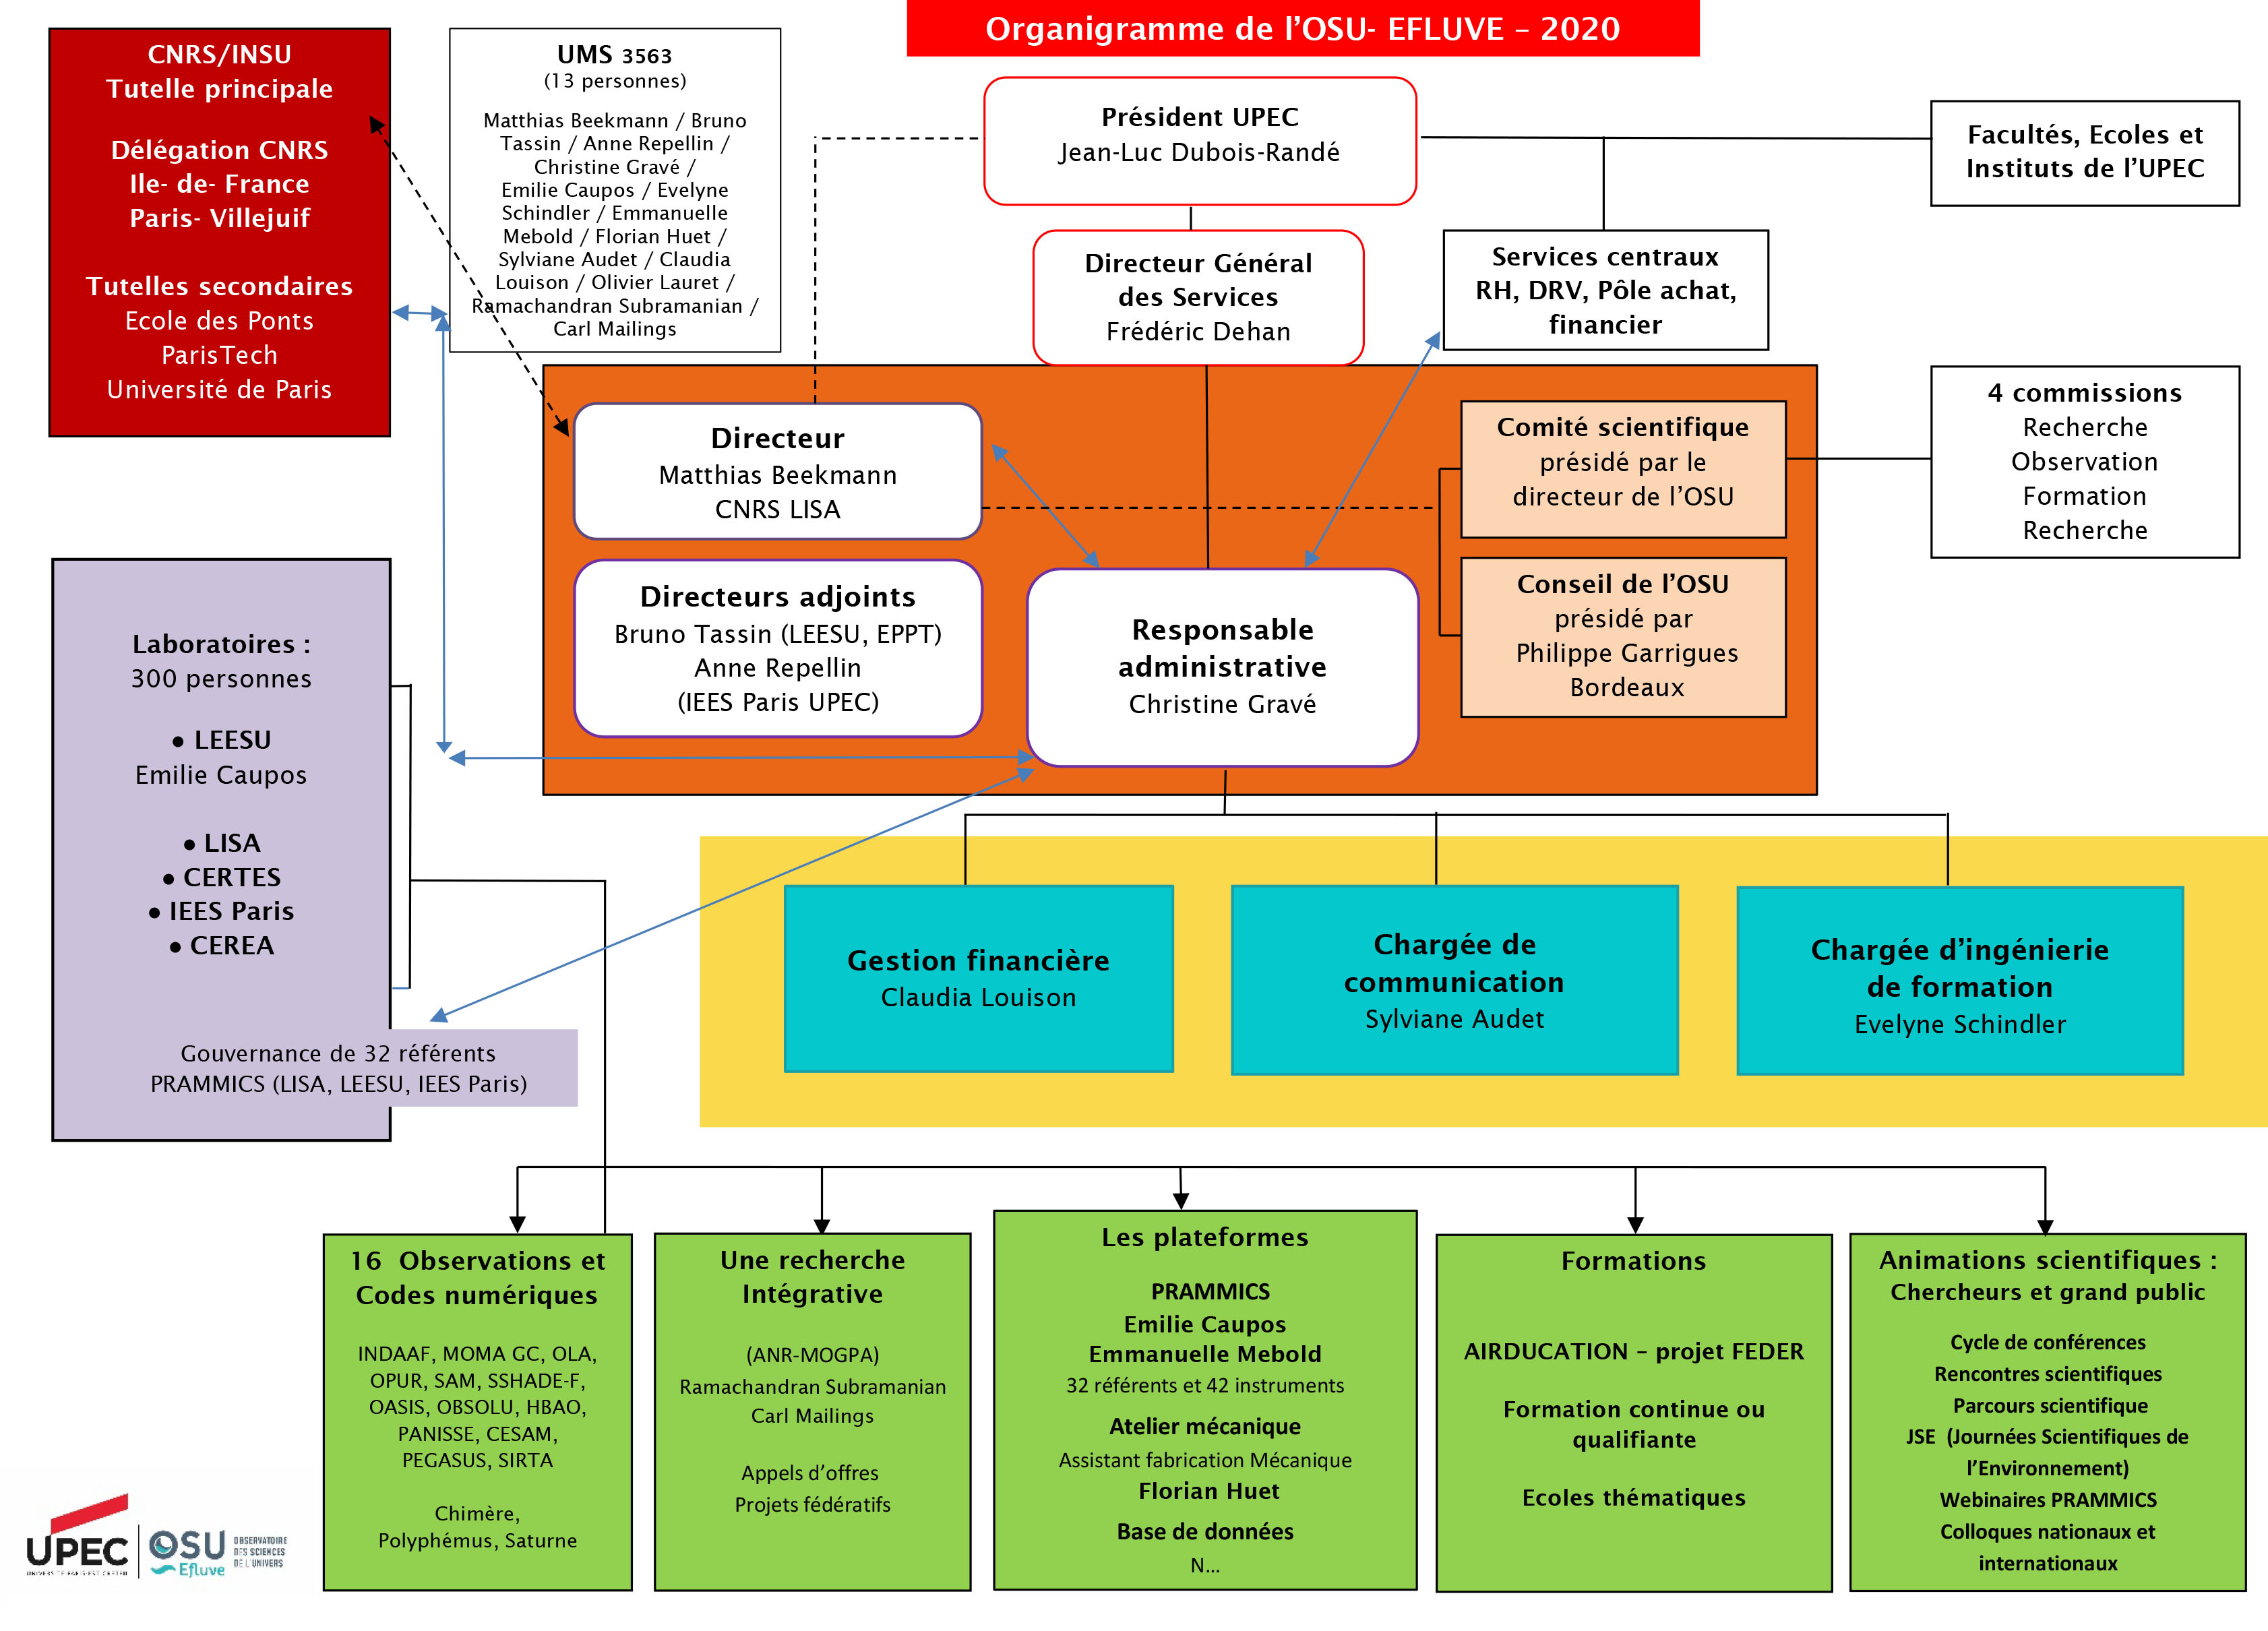 Organigramme OSU sept 2020